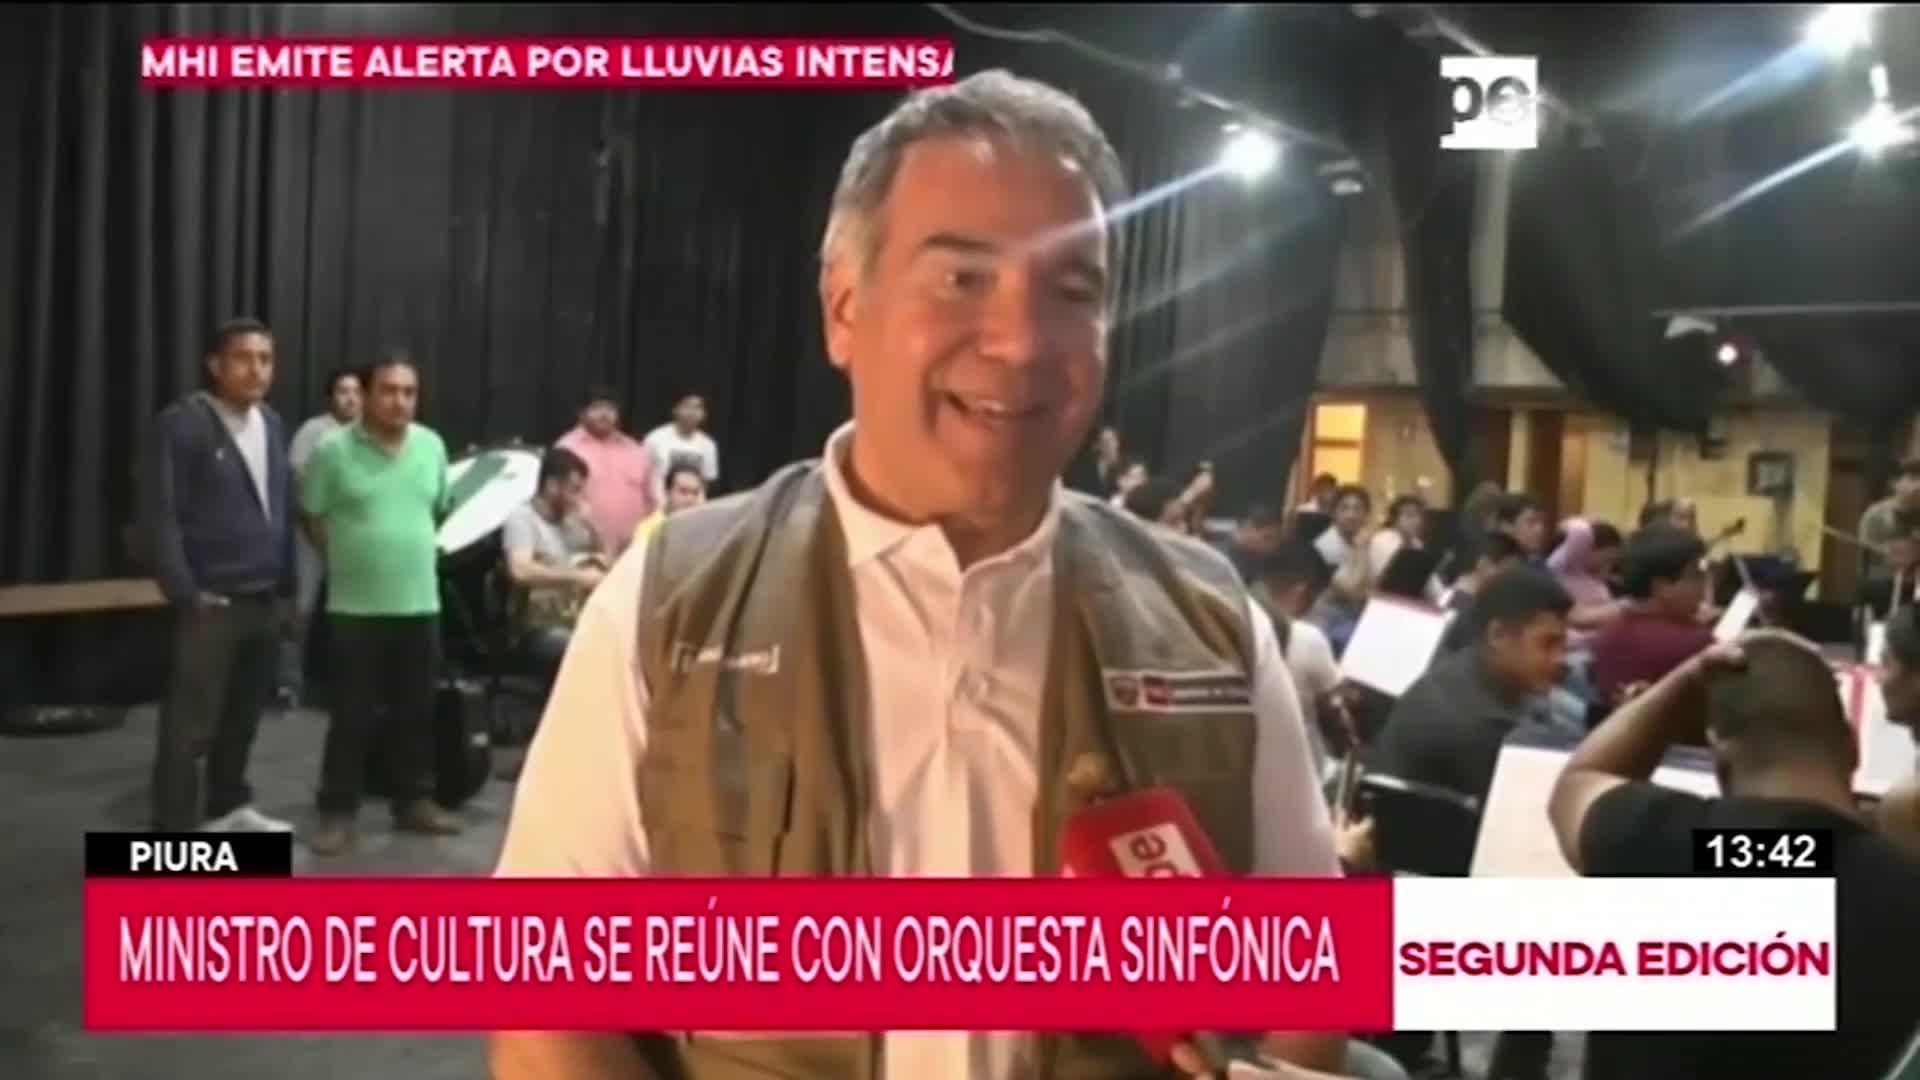 Ministro de Cultura llegó a Piura y se reunió con orquesta sinfónica